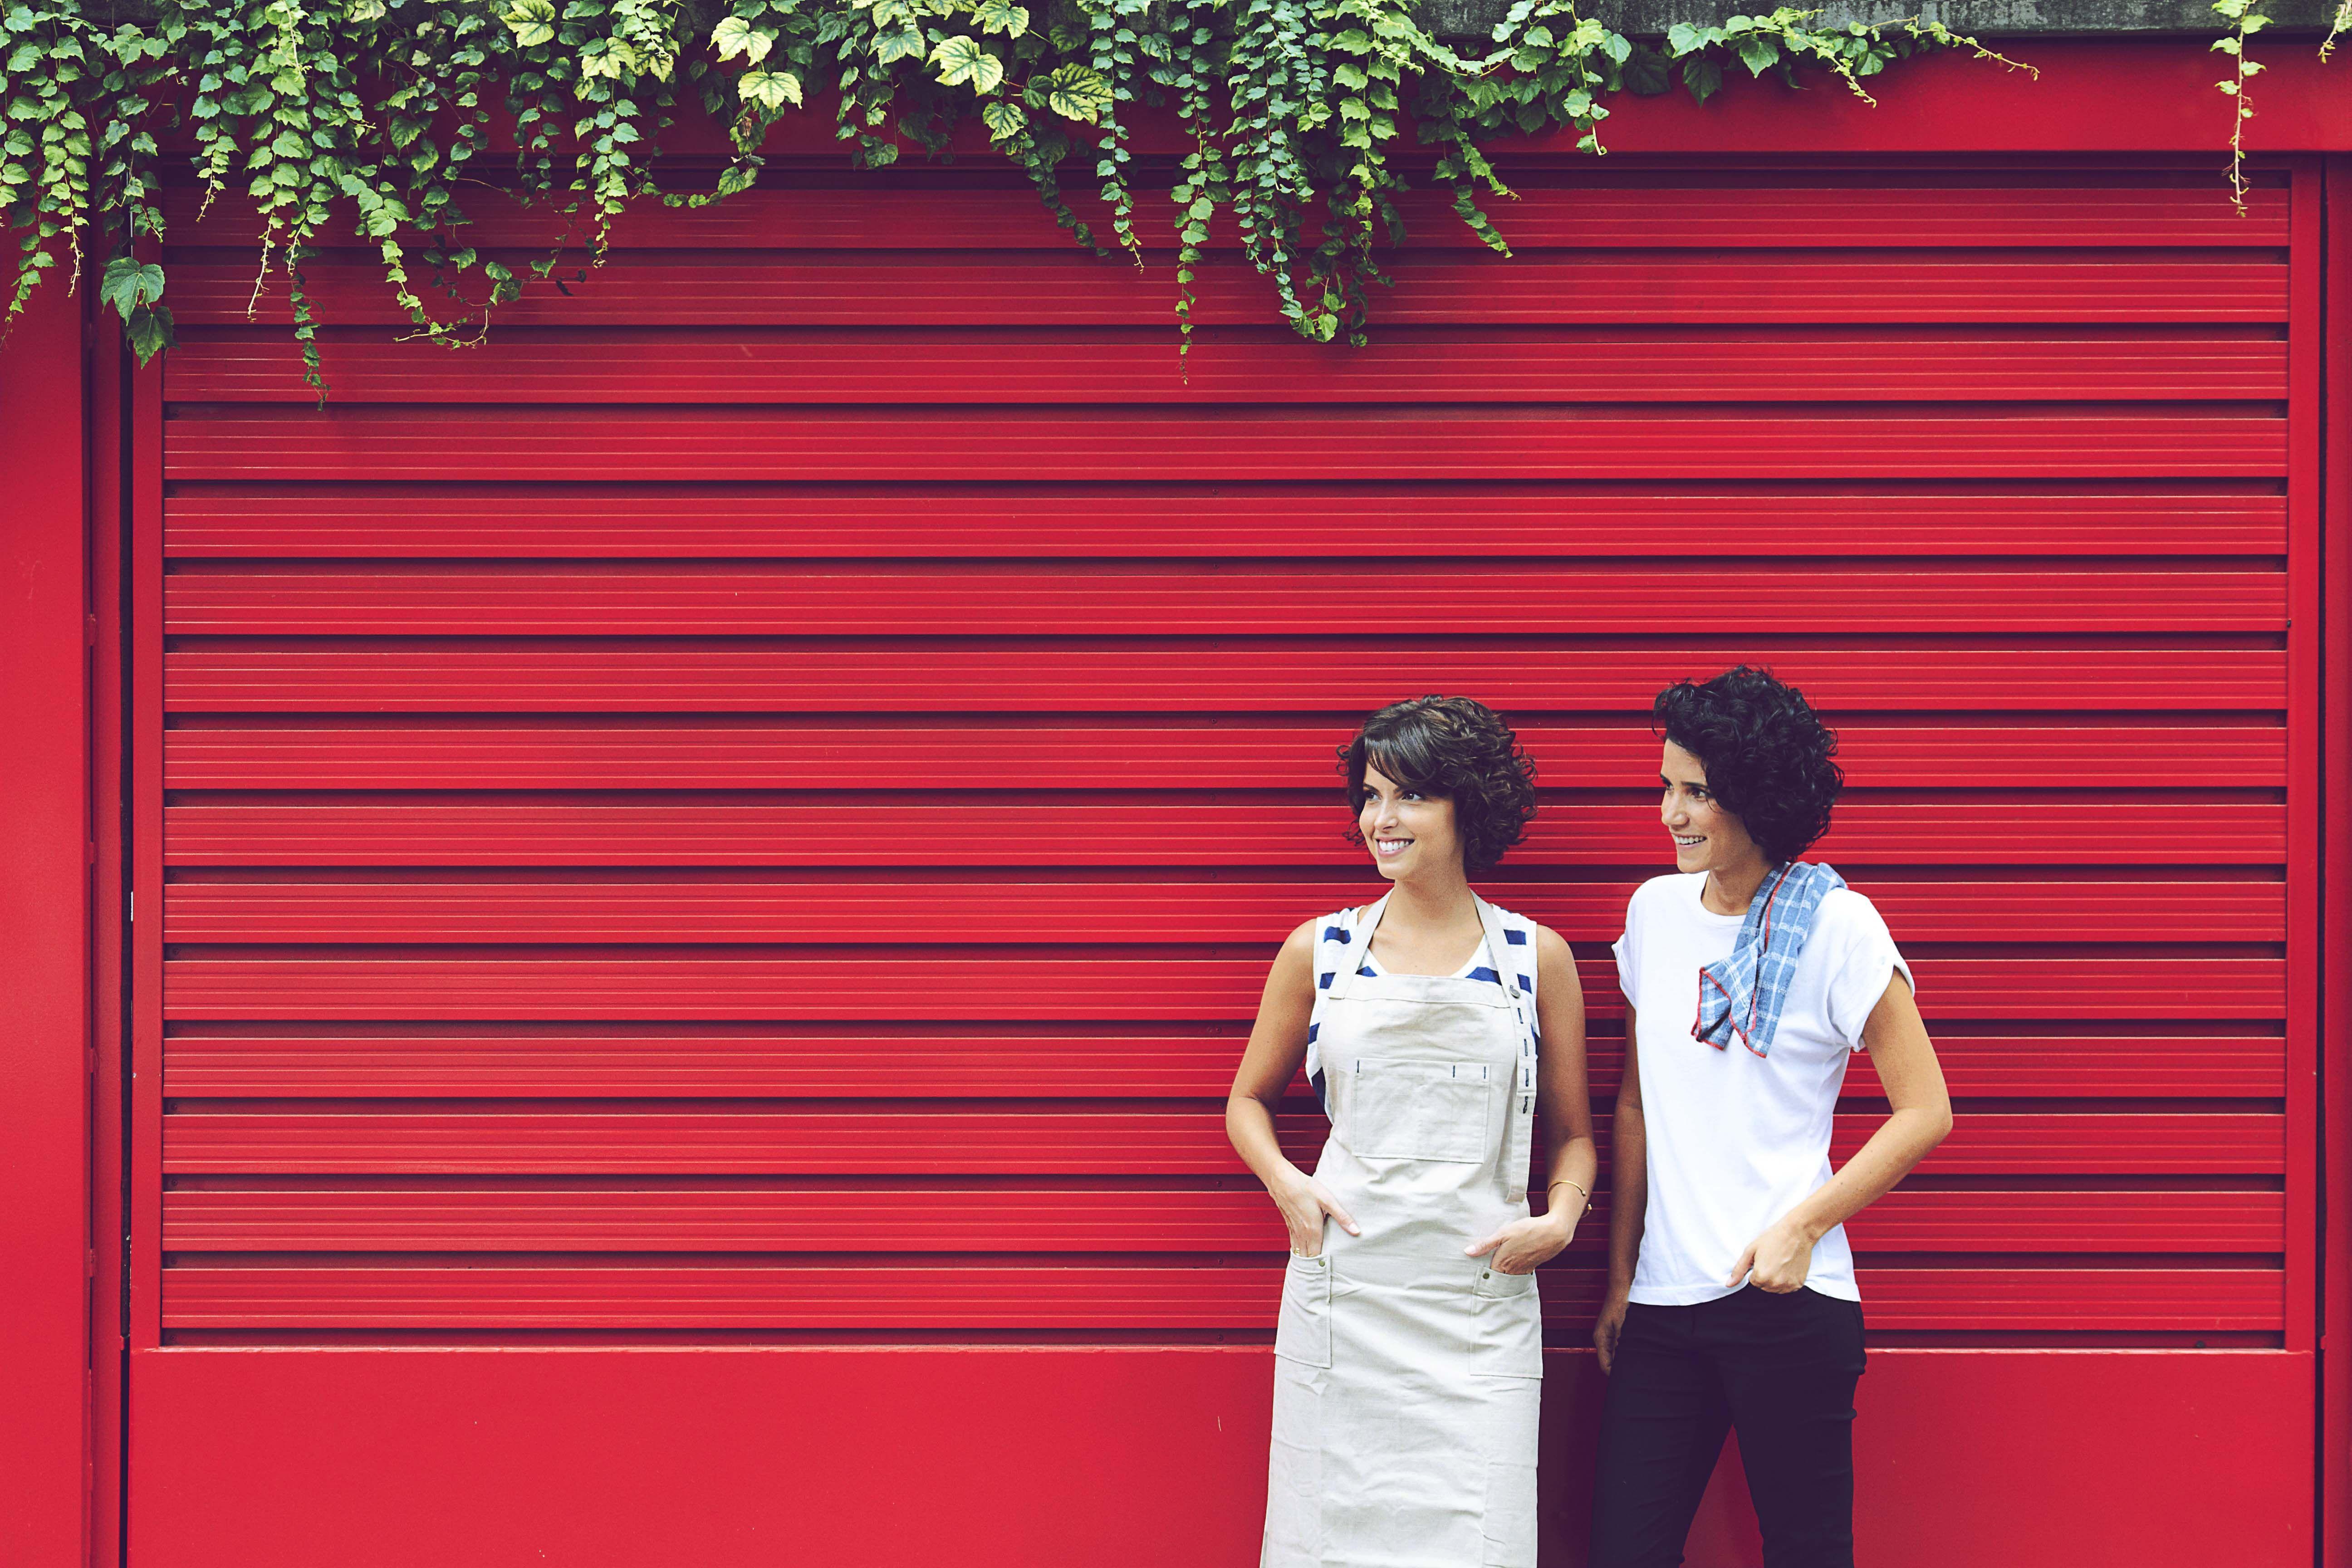 Larissa de avental craft e Joanna com guardanapo xadrez para il casalingo